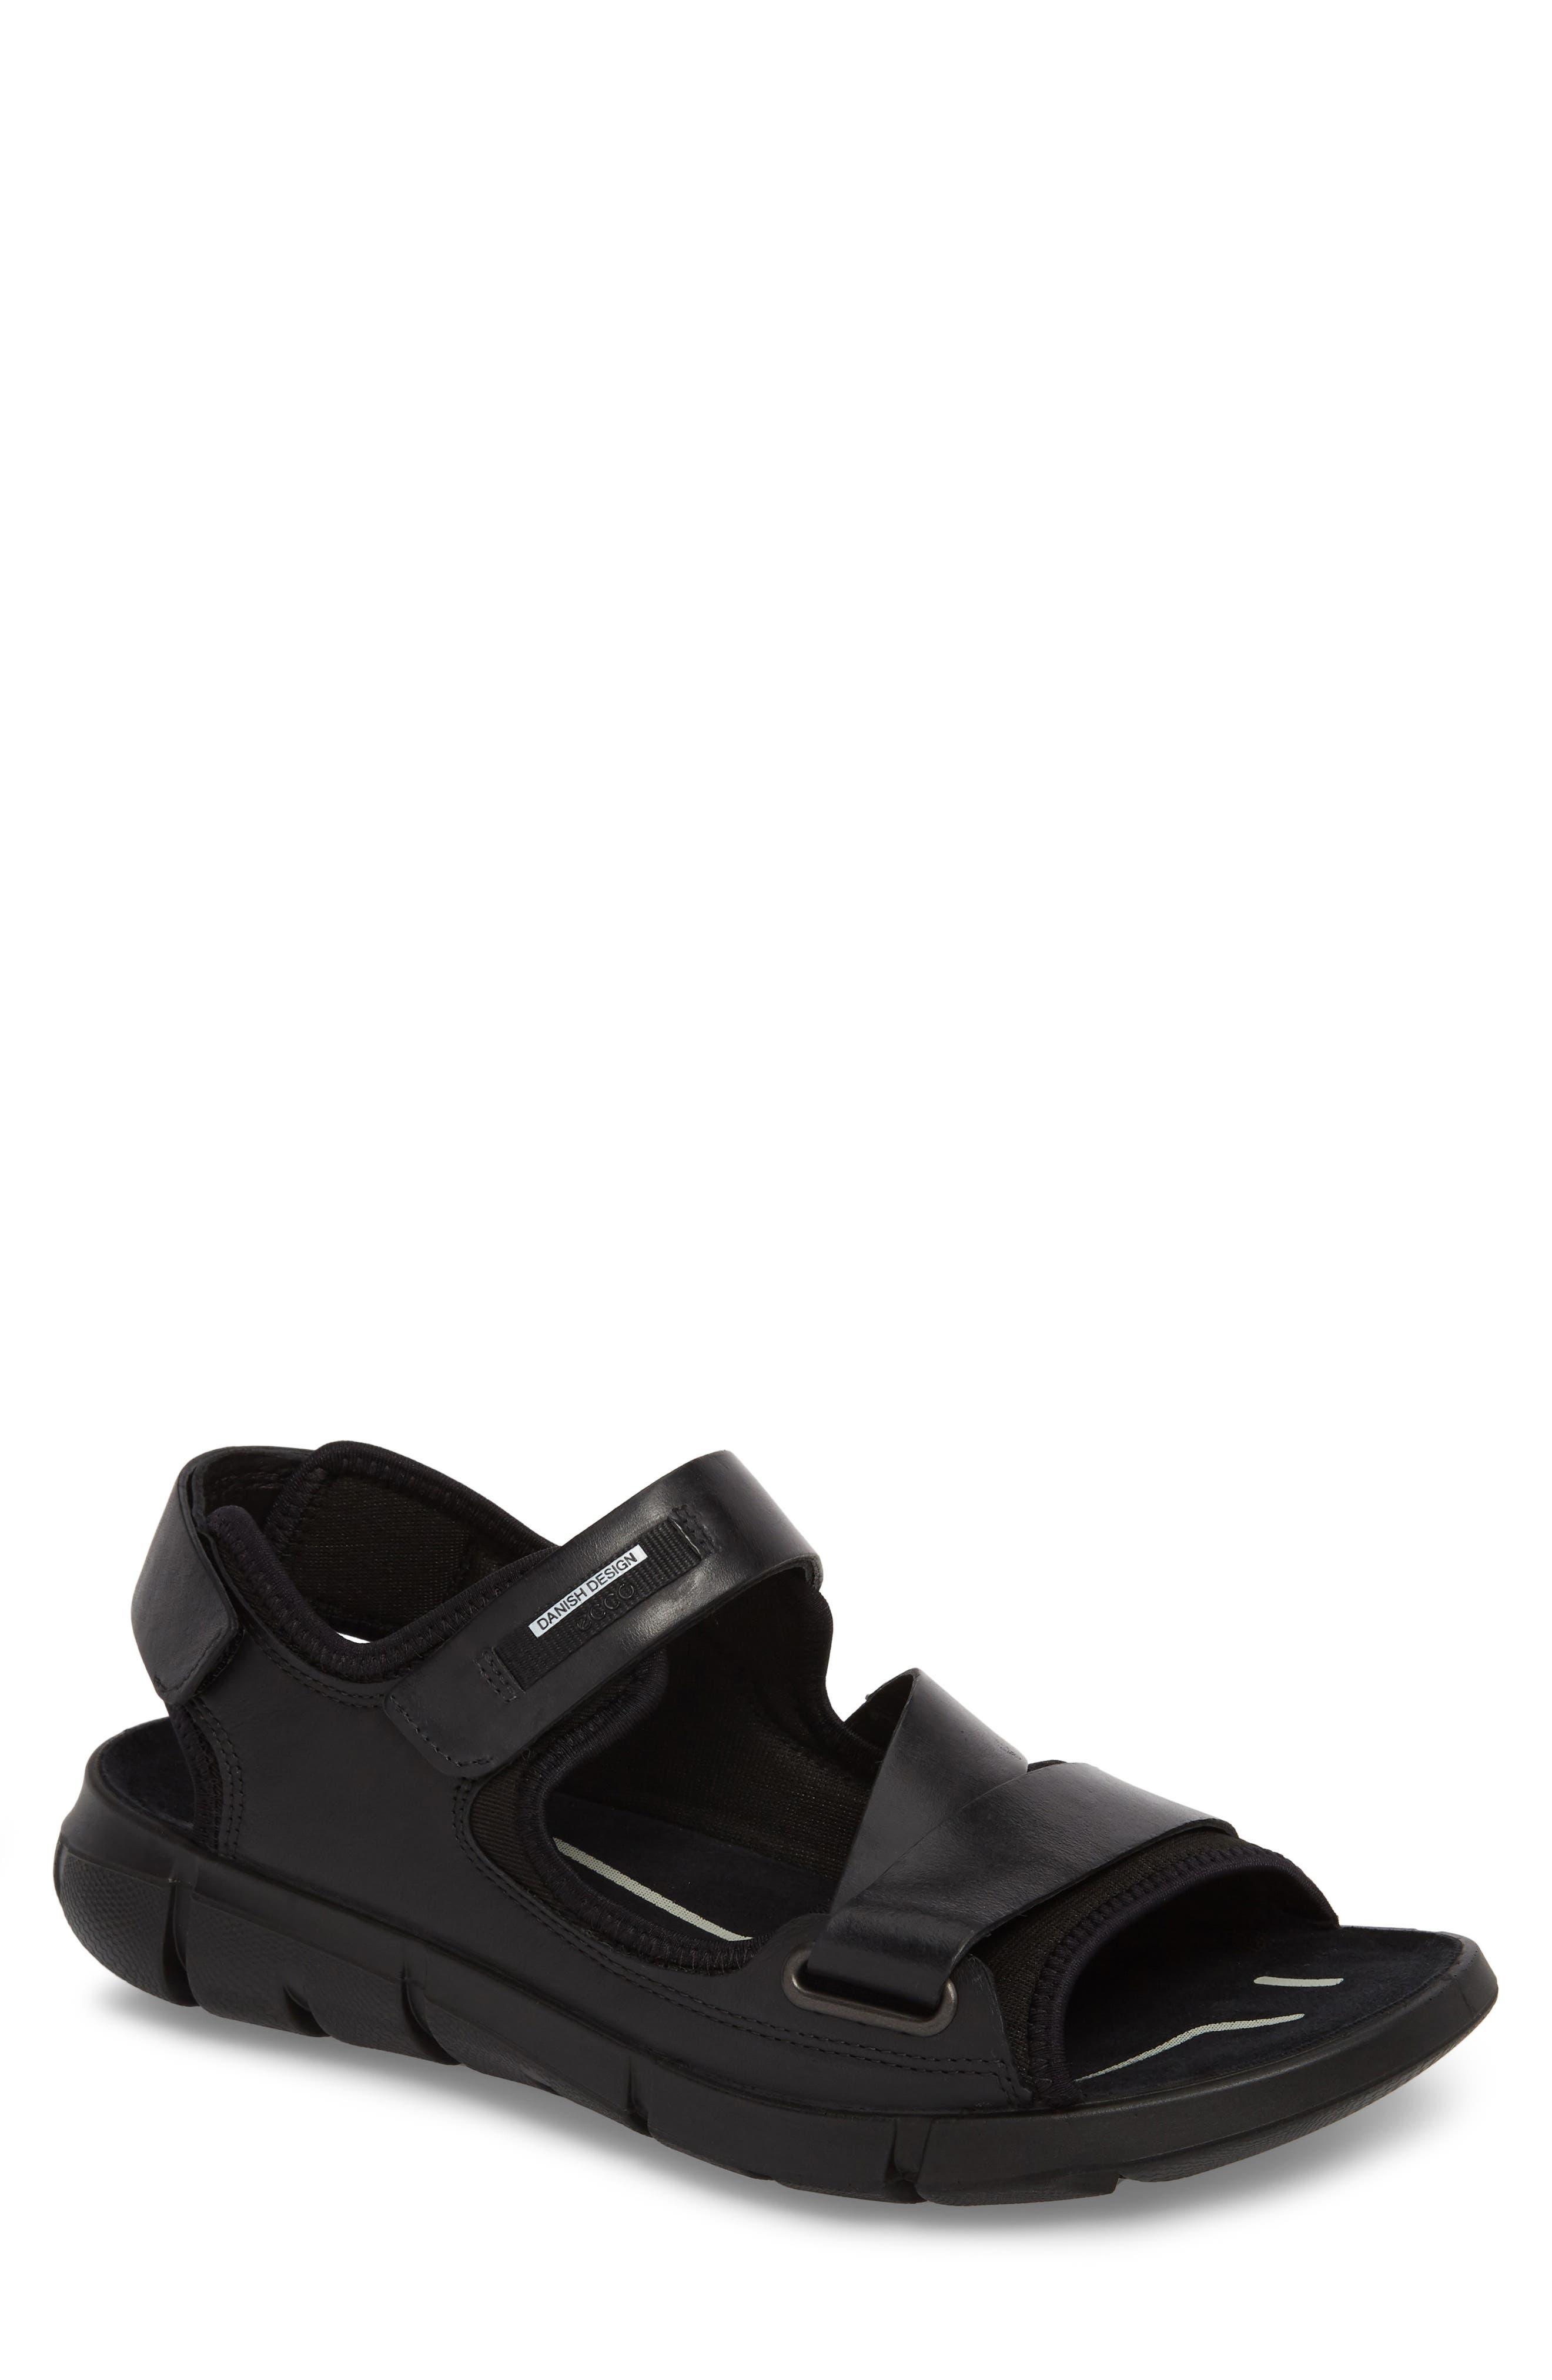 Intrinsic 2 Sandal,                         Main,                         color, Black Leather